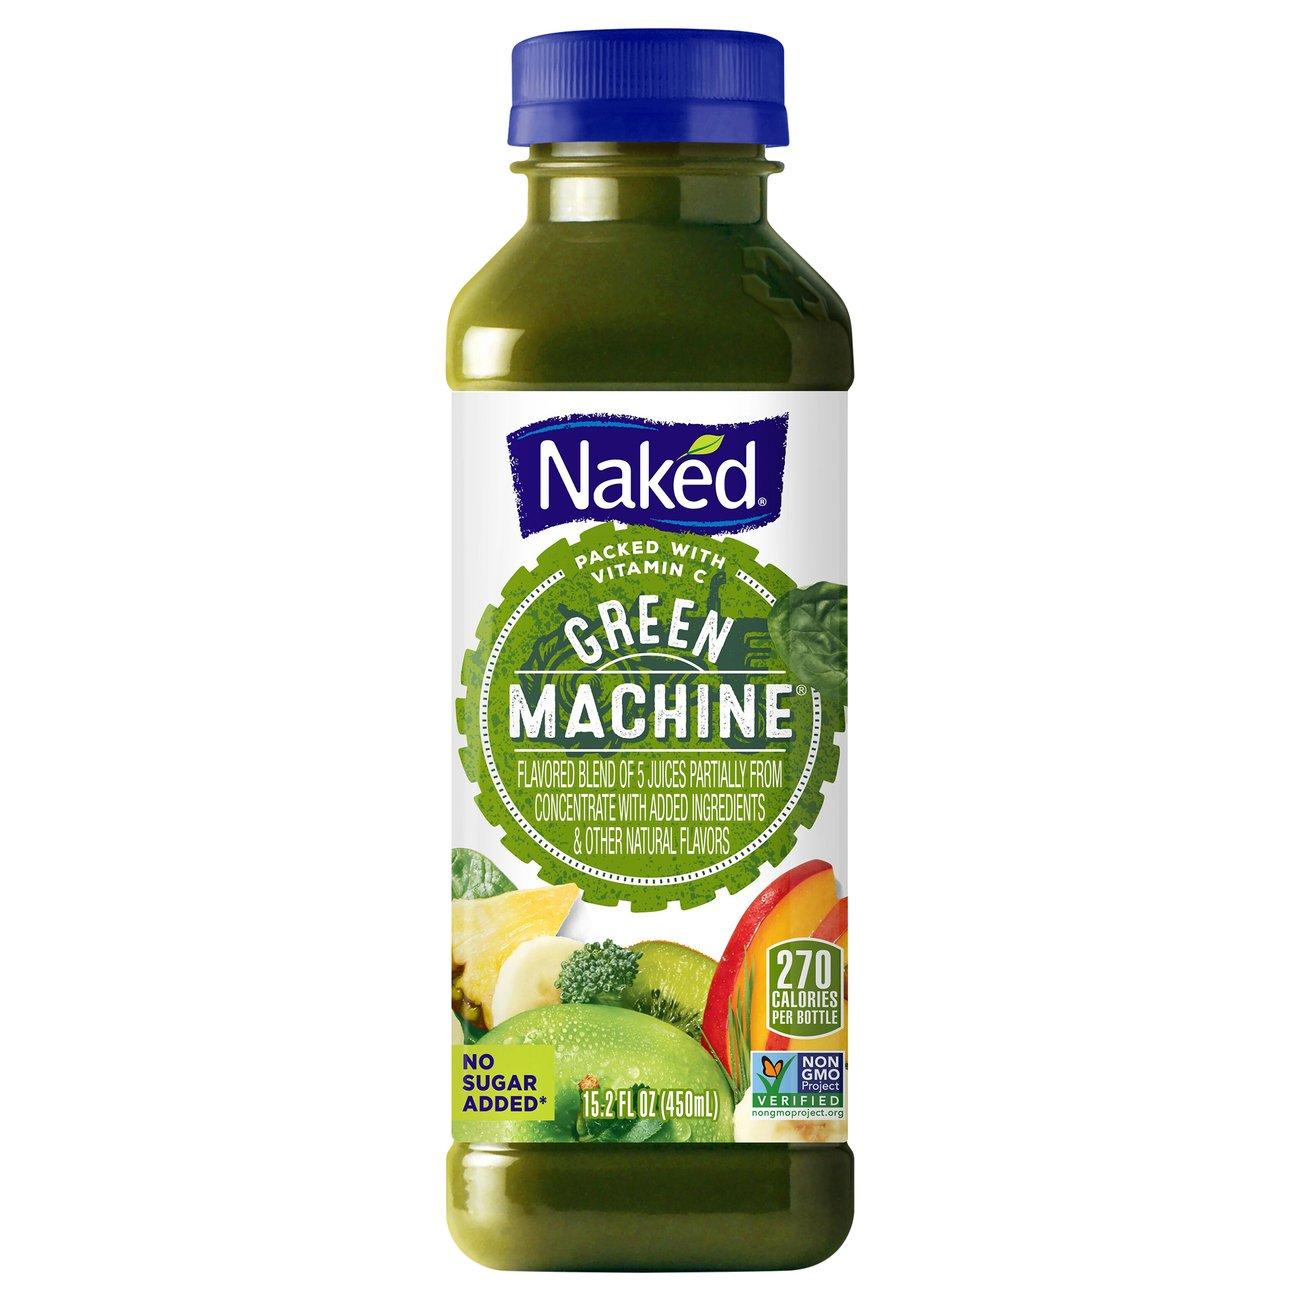 Naked 100% Juice Smoothie, Green Machine - 15.2 fl oz (450 ml) - 15.2 fl oz (450 ml)